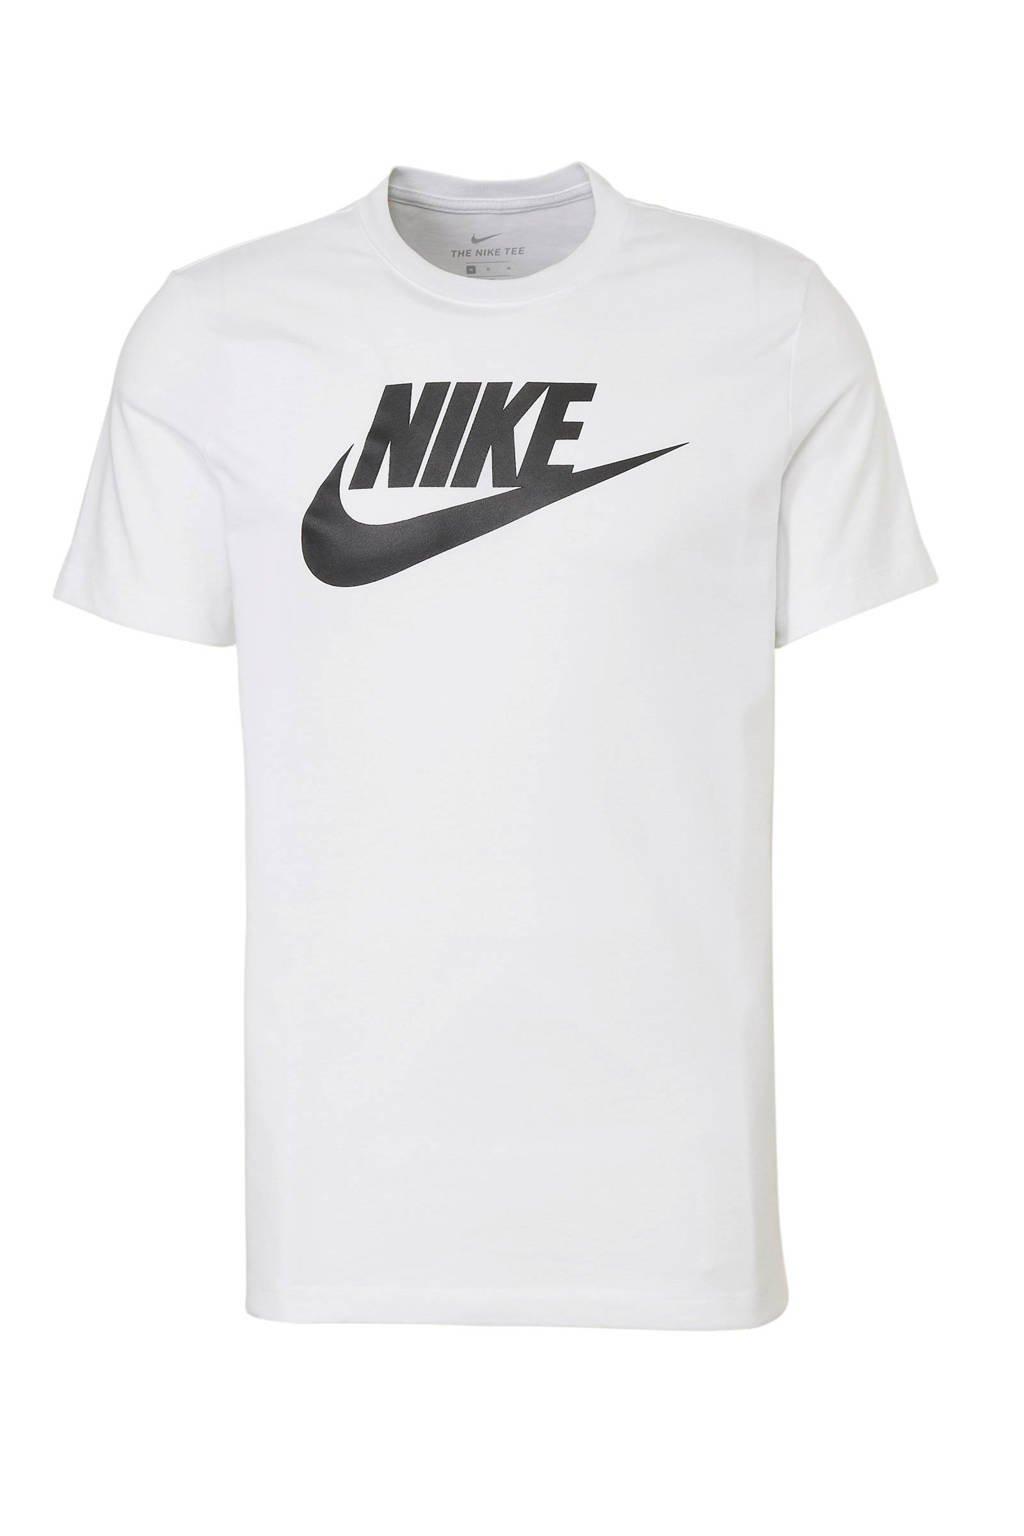 Nike sport T-shirt met printopdruk wit, Wit